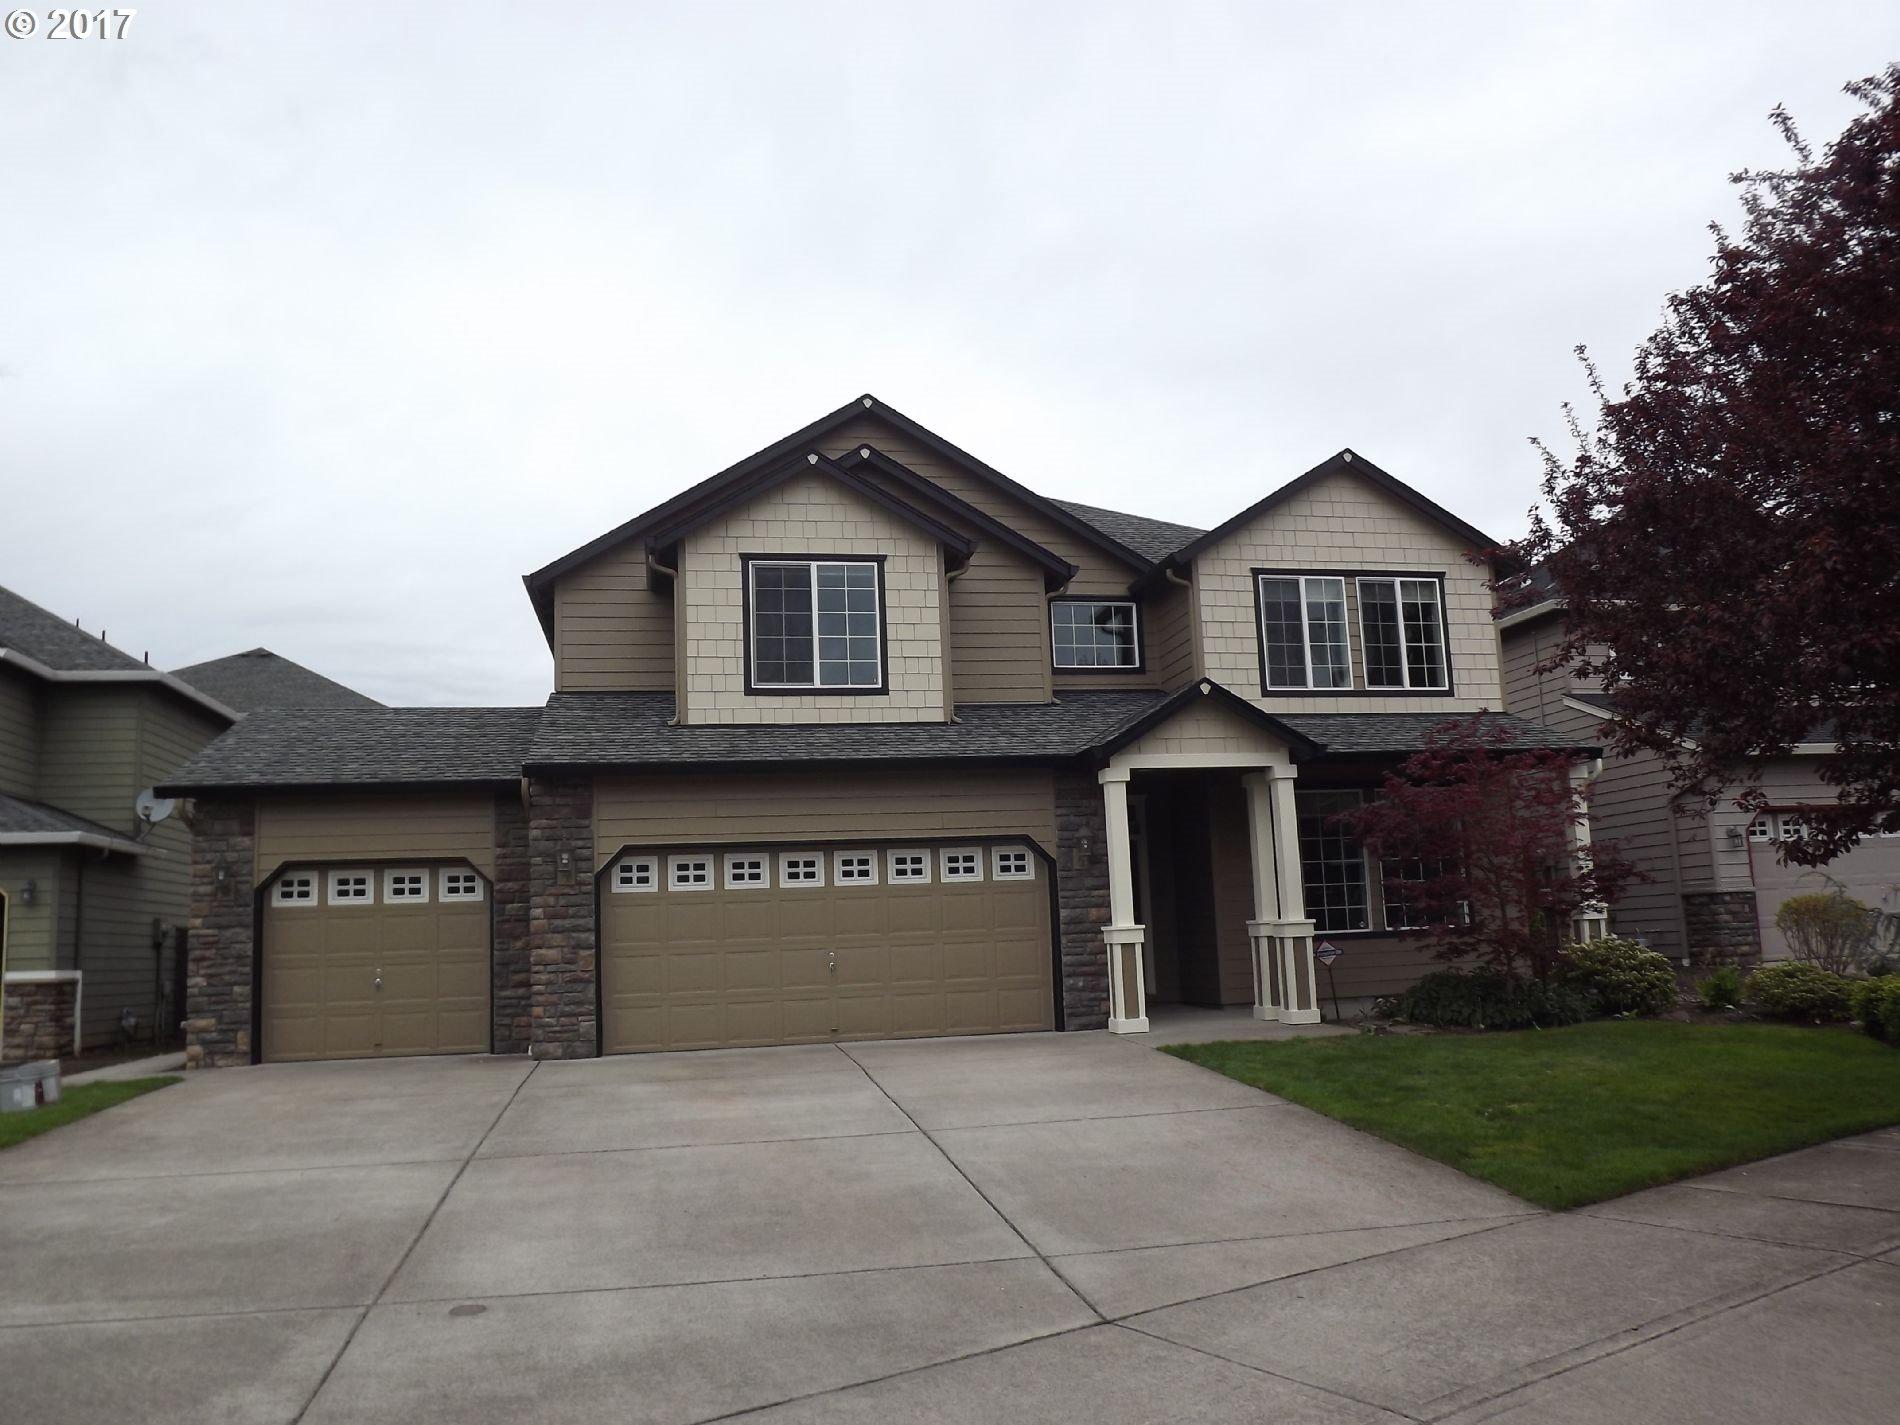 3706 NE 93RD ST, Vancouver, WA 98665